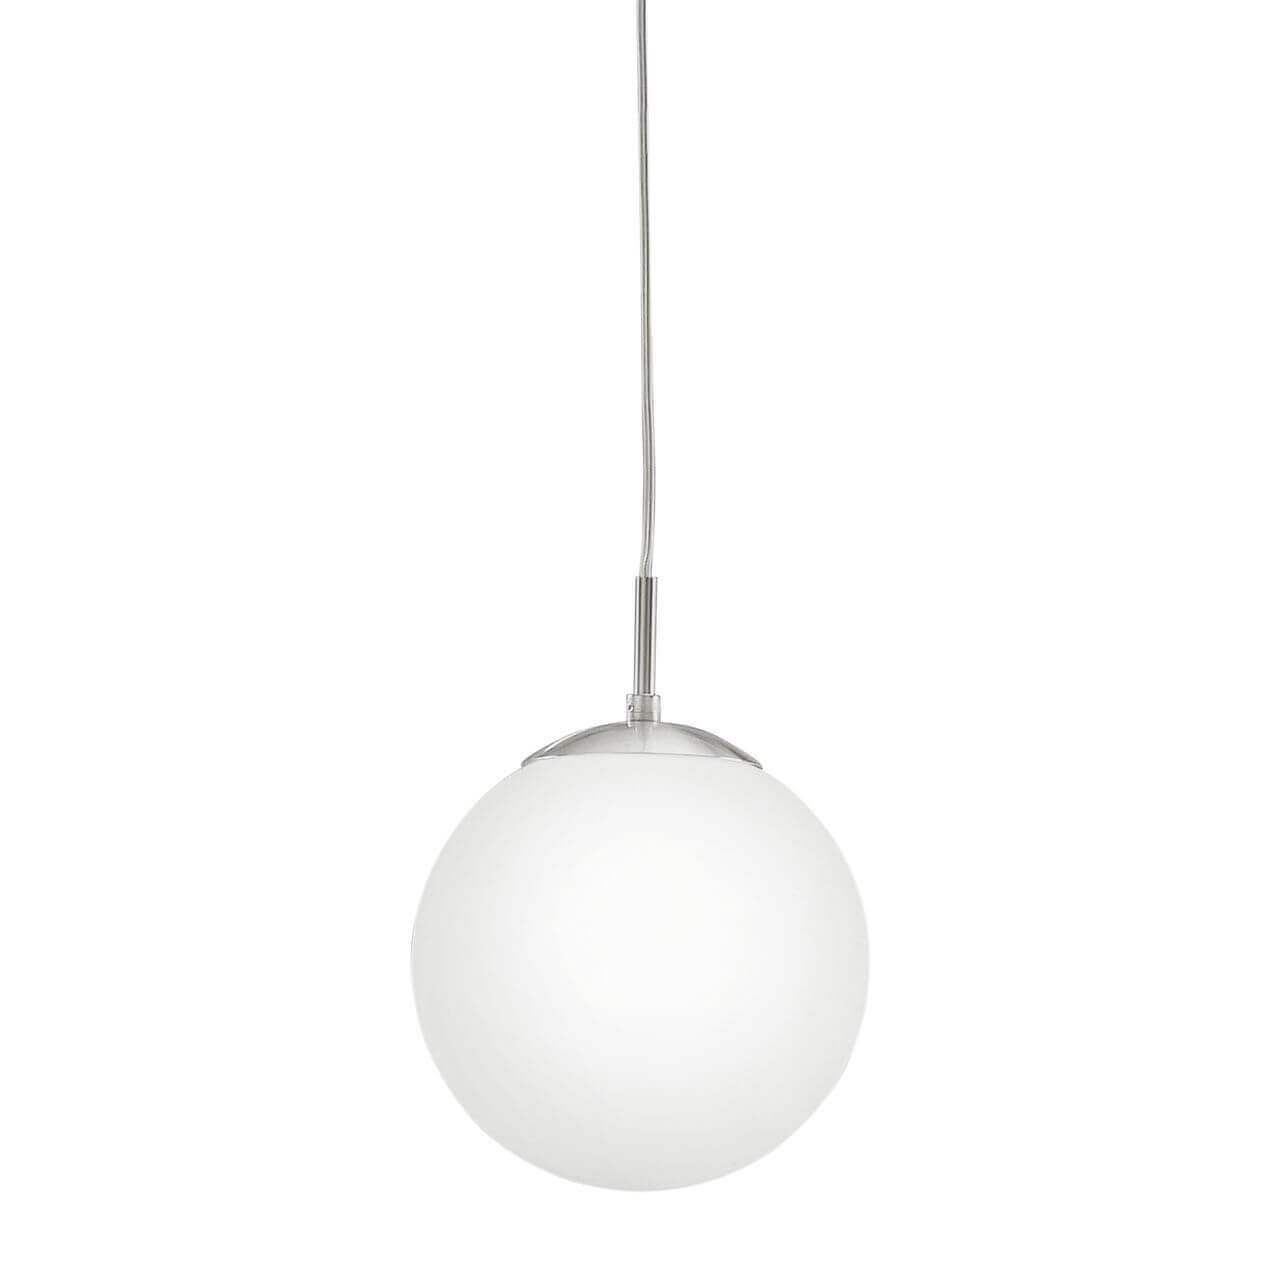 Светильник Eglo 85261 Rondo цена 2017